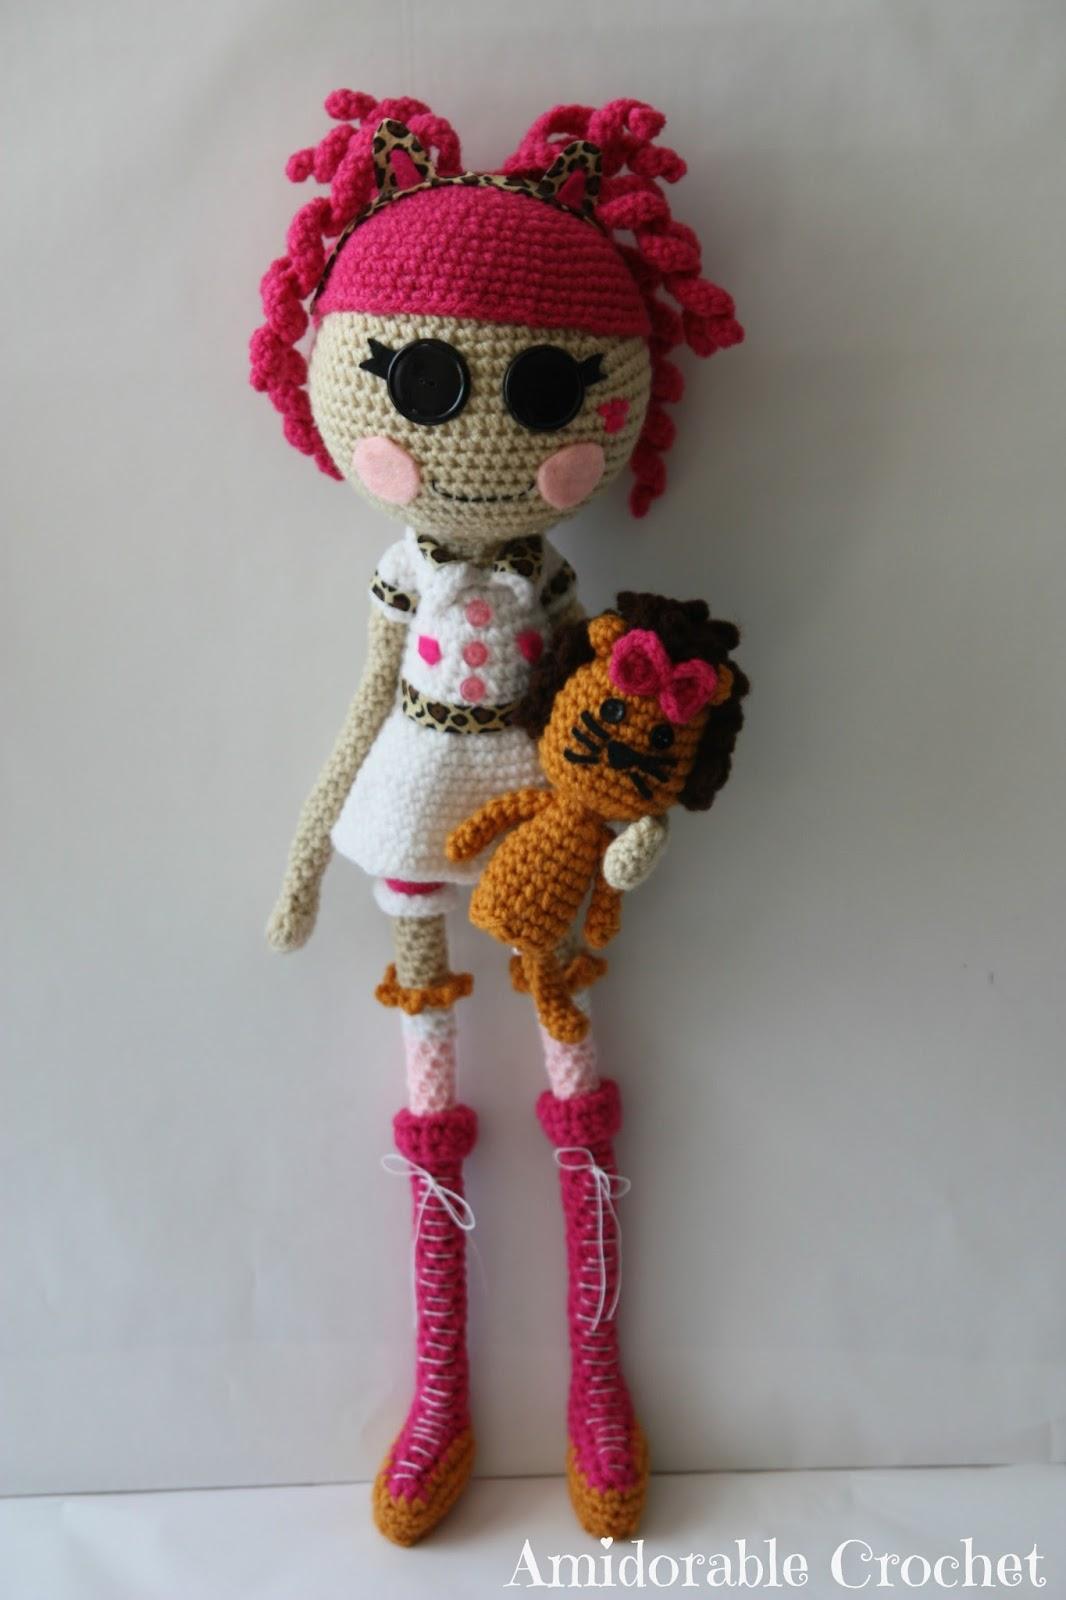 Crochet Wedding Dolls Pattern : A[mi]dorable Crochet: Lalaloopsy Doll